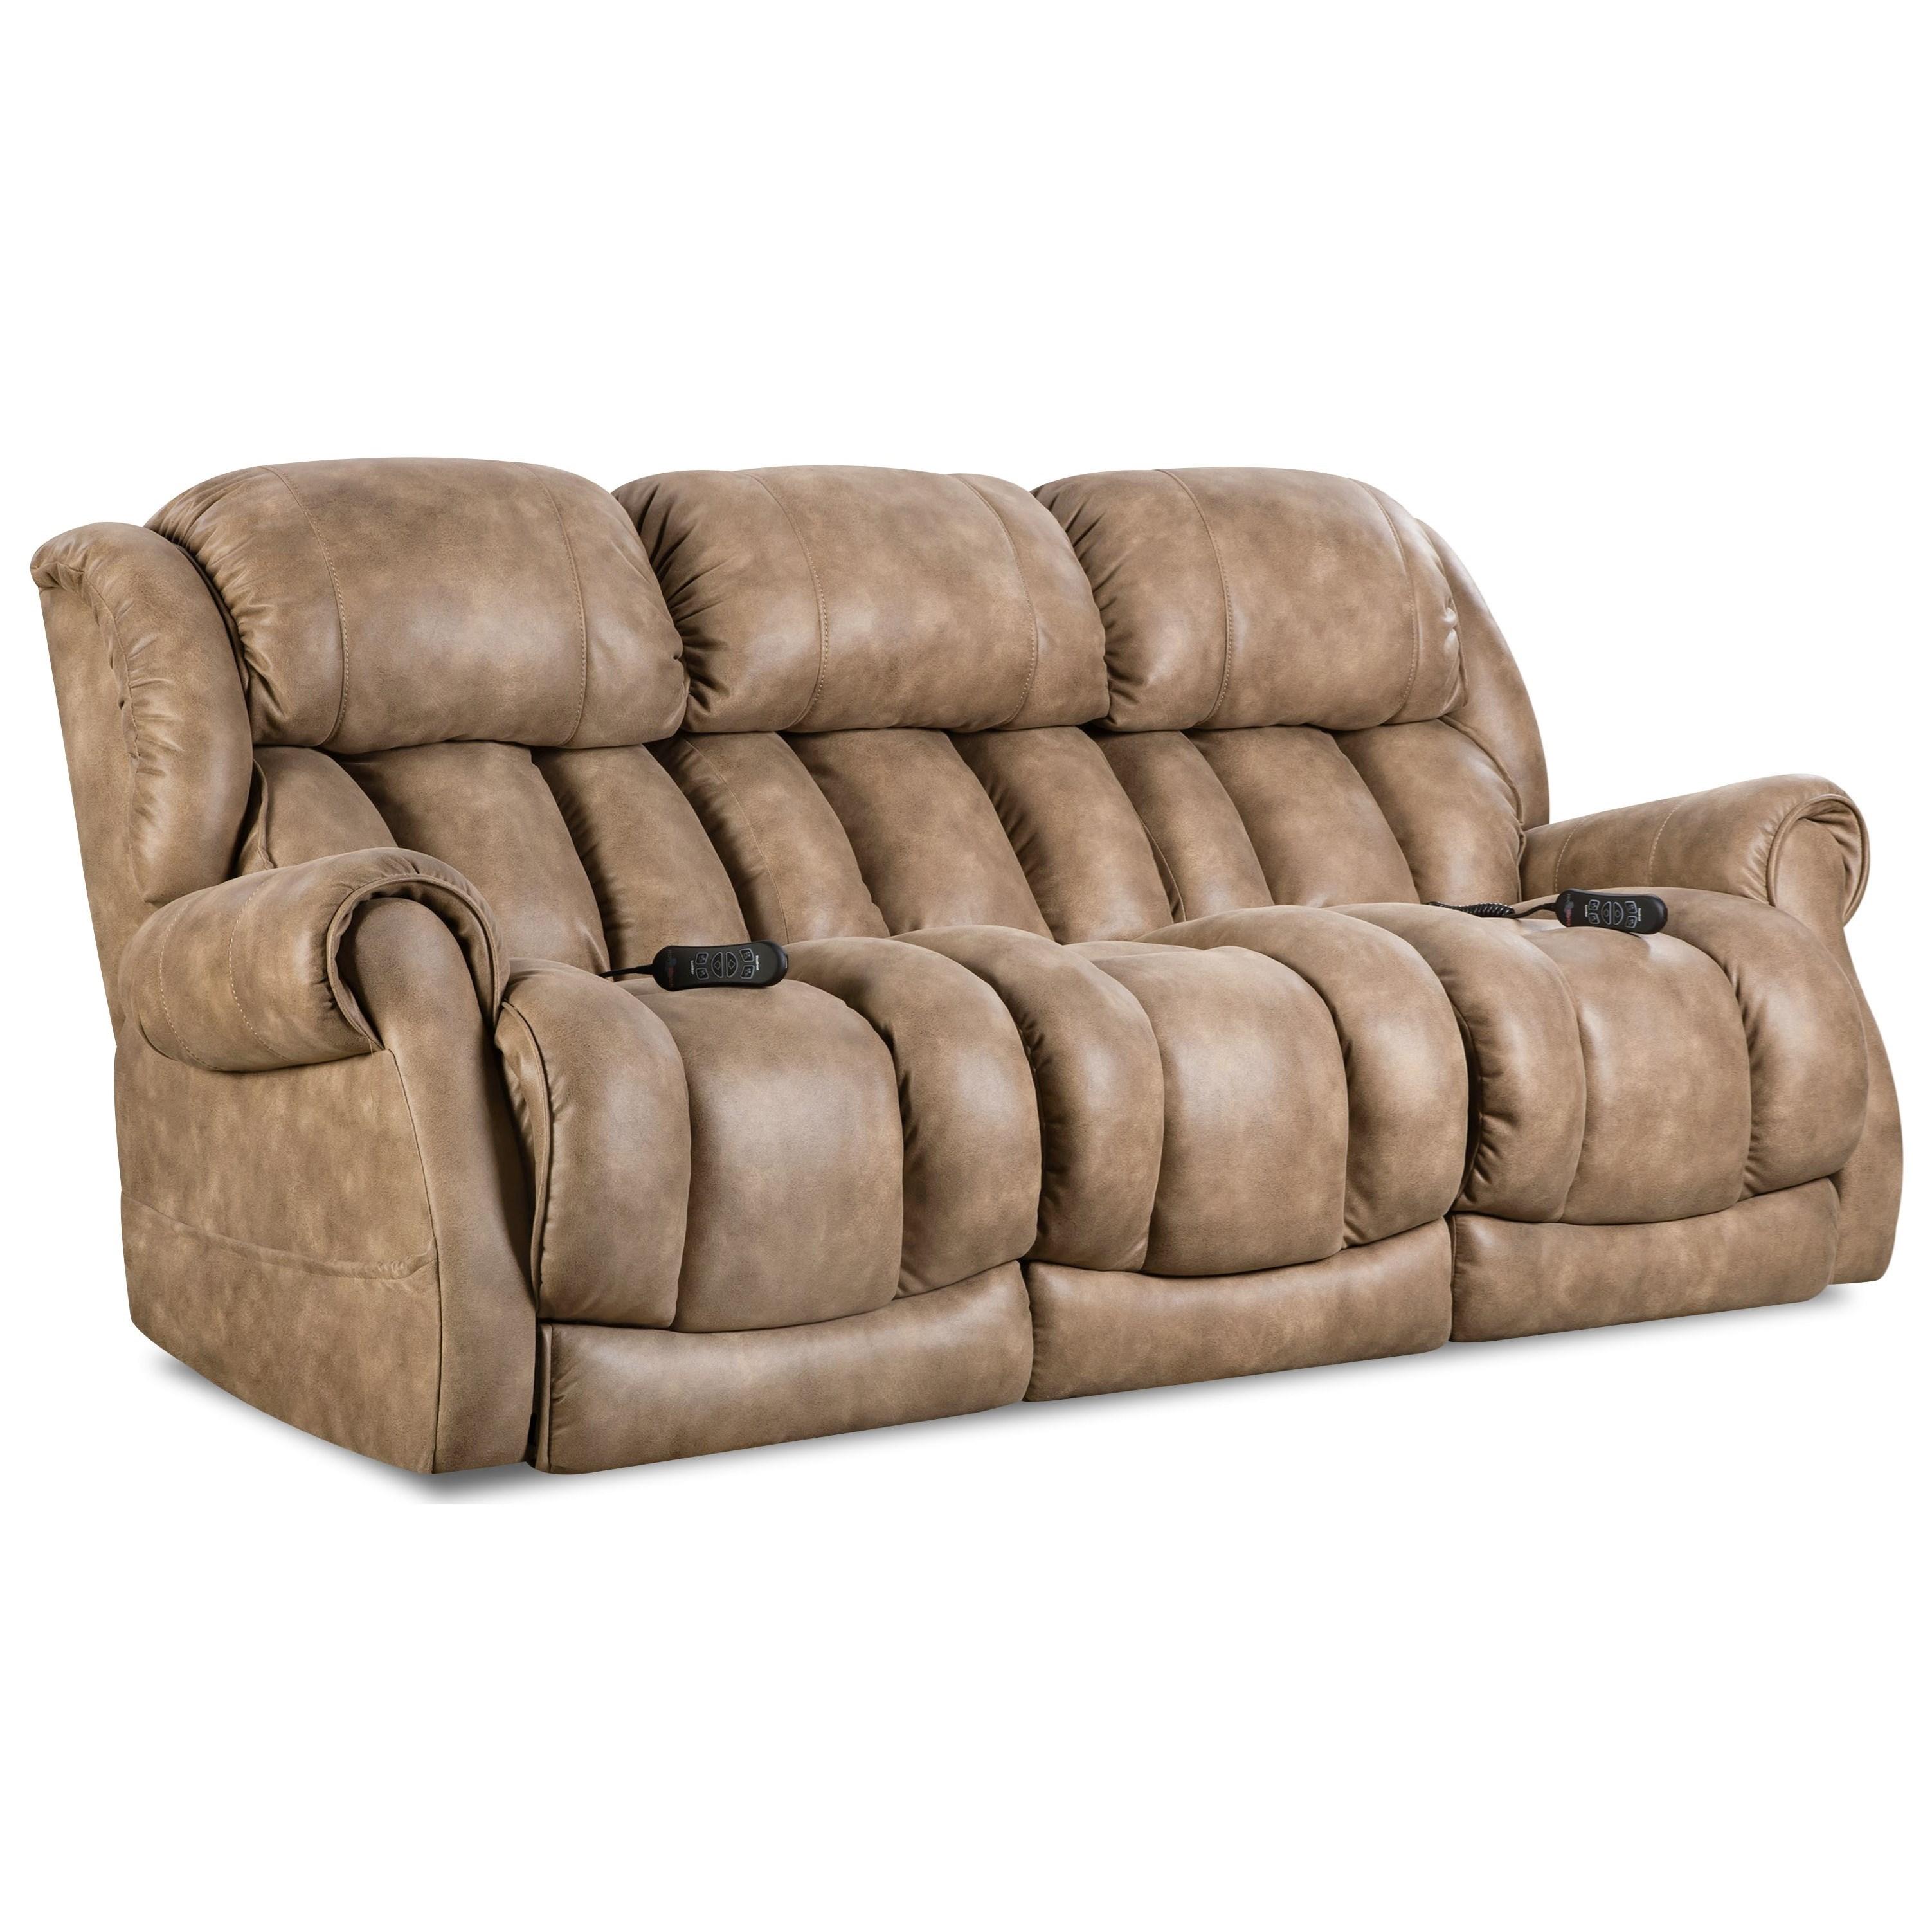 HomeStretch Atlantis Power Reclining Sofa - Item Number: 146-37-15